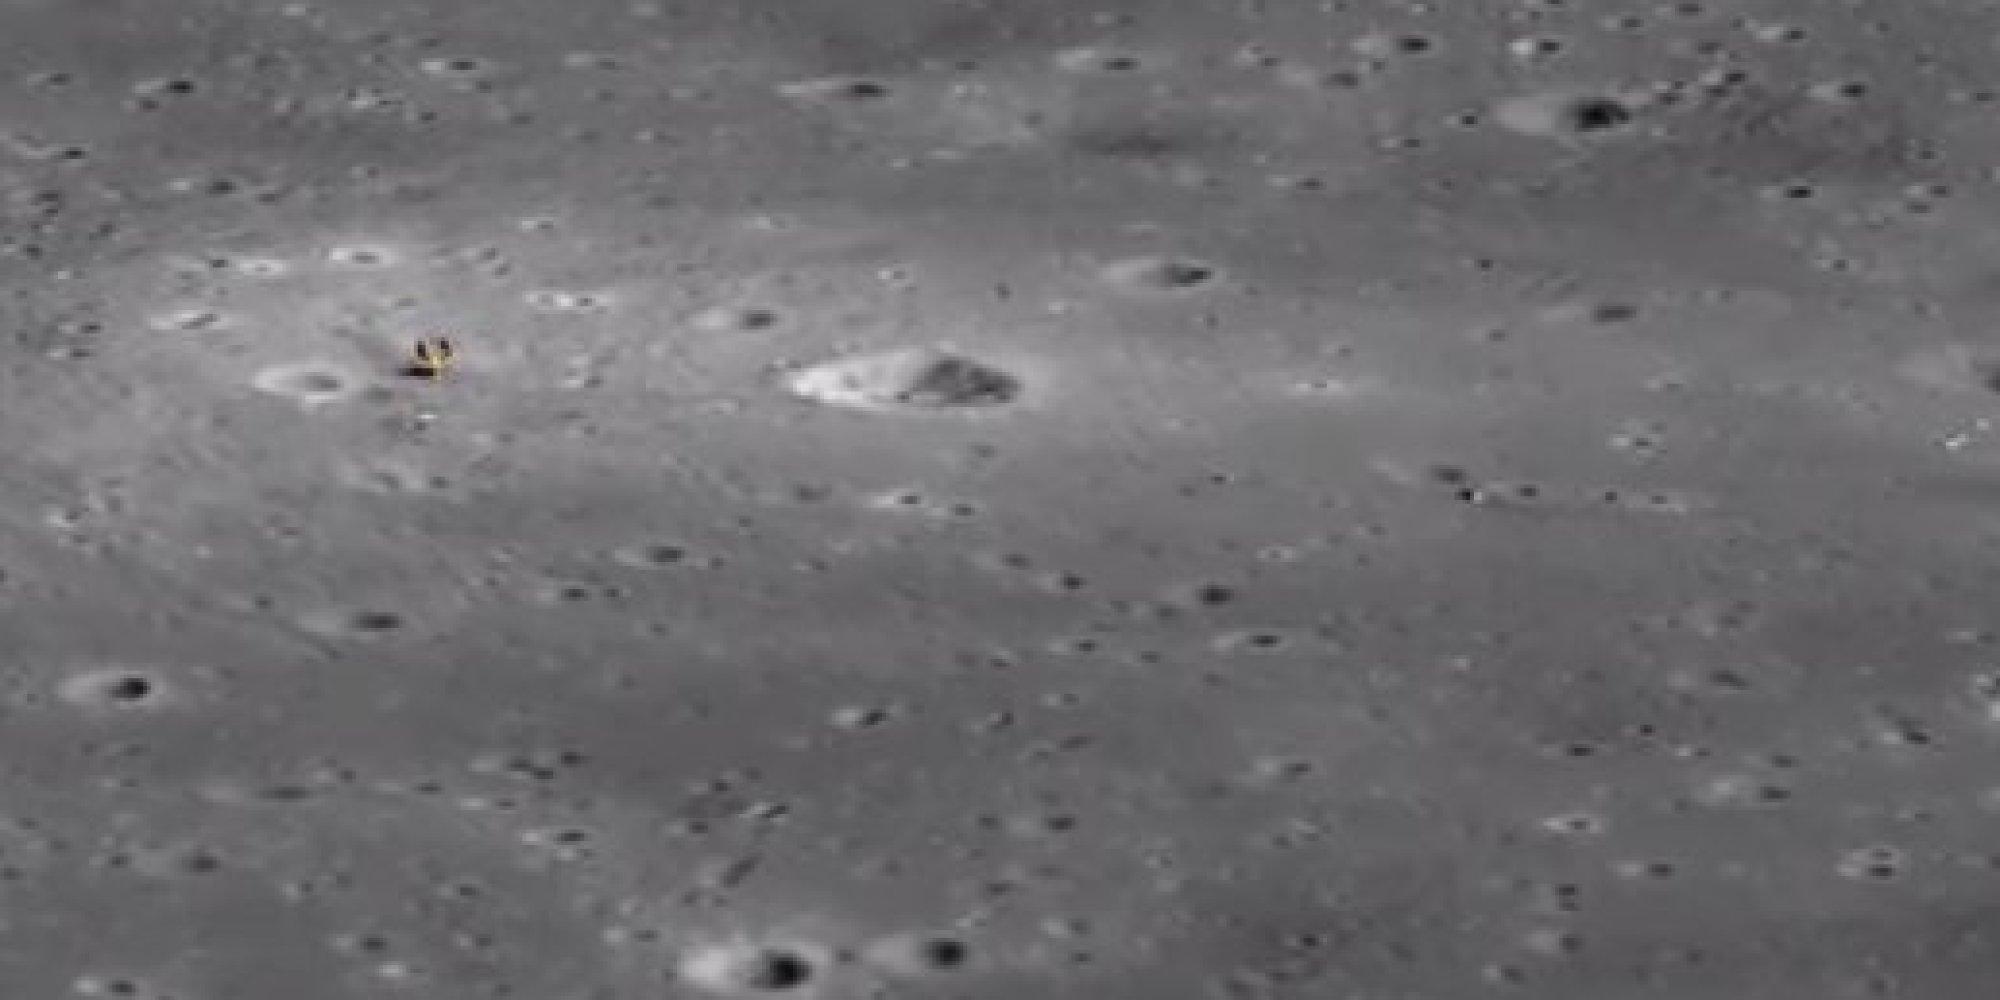 moon landing sites - photo #10